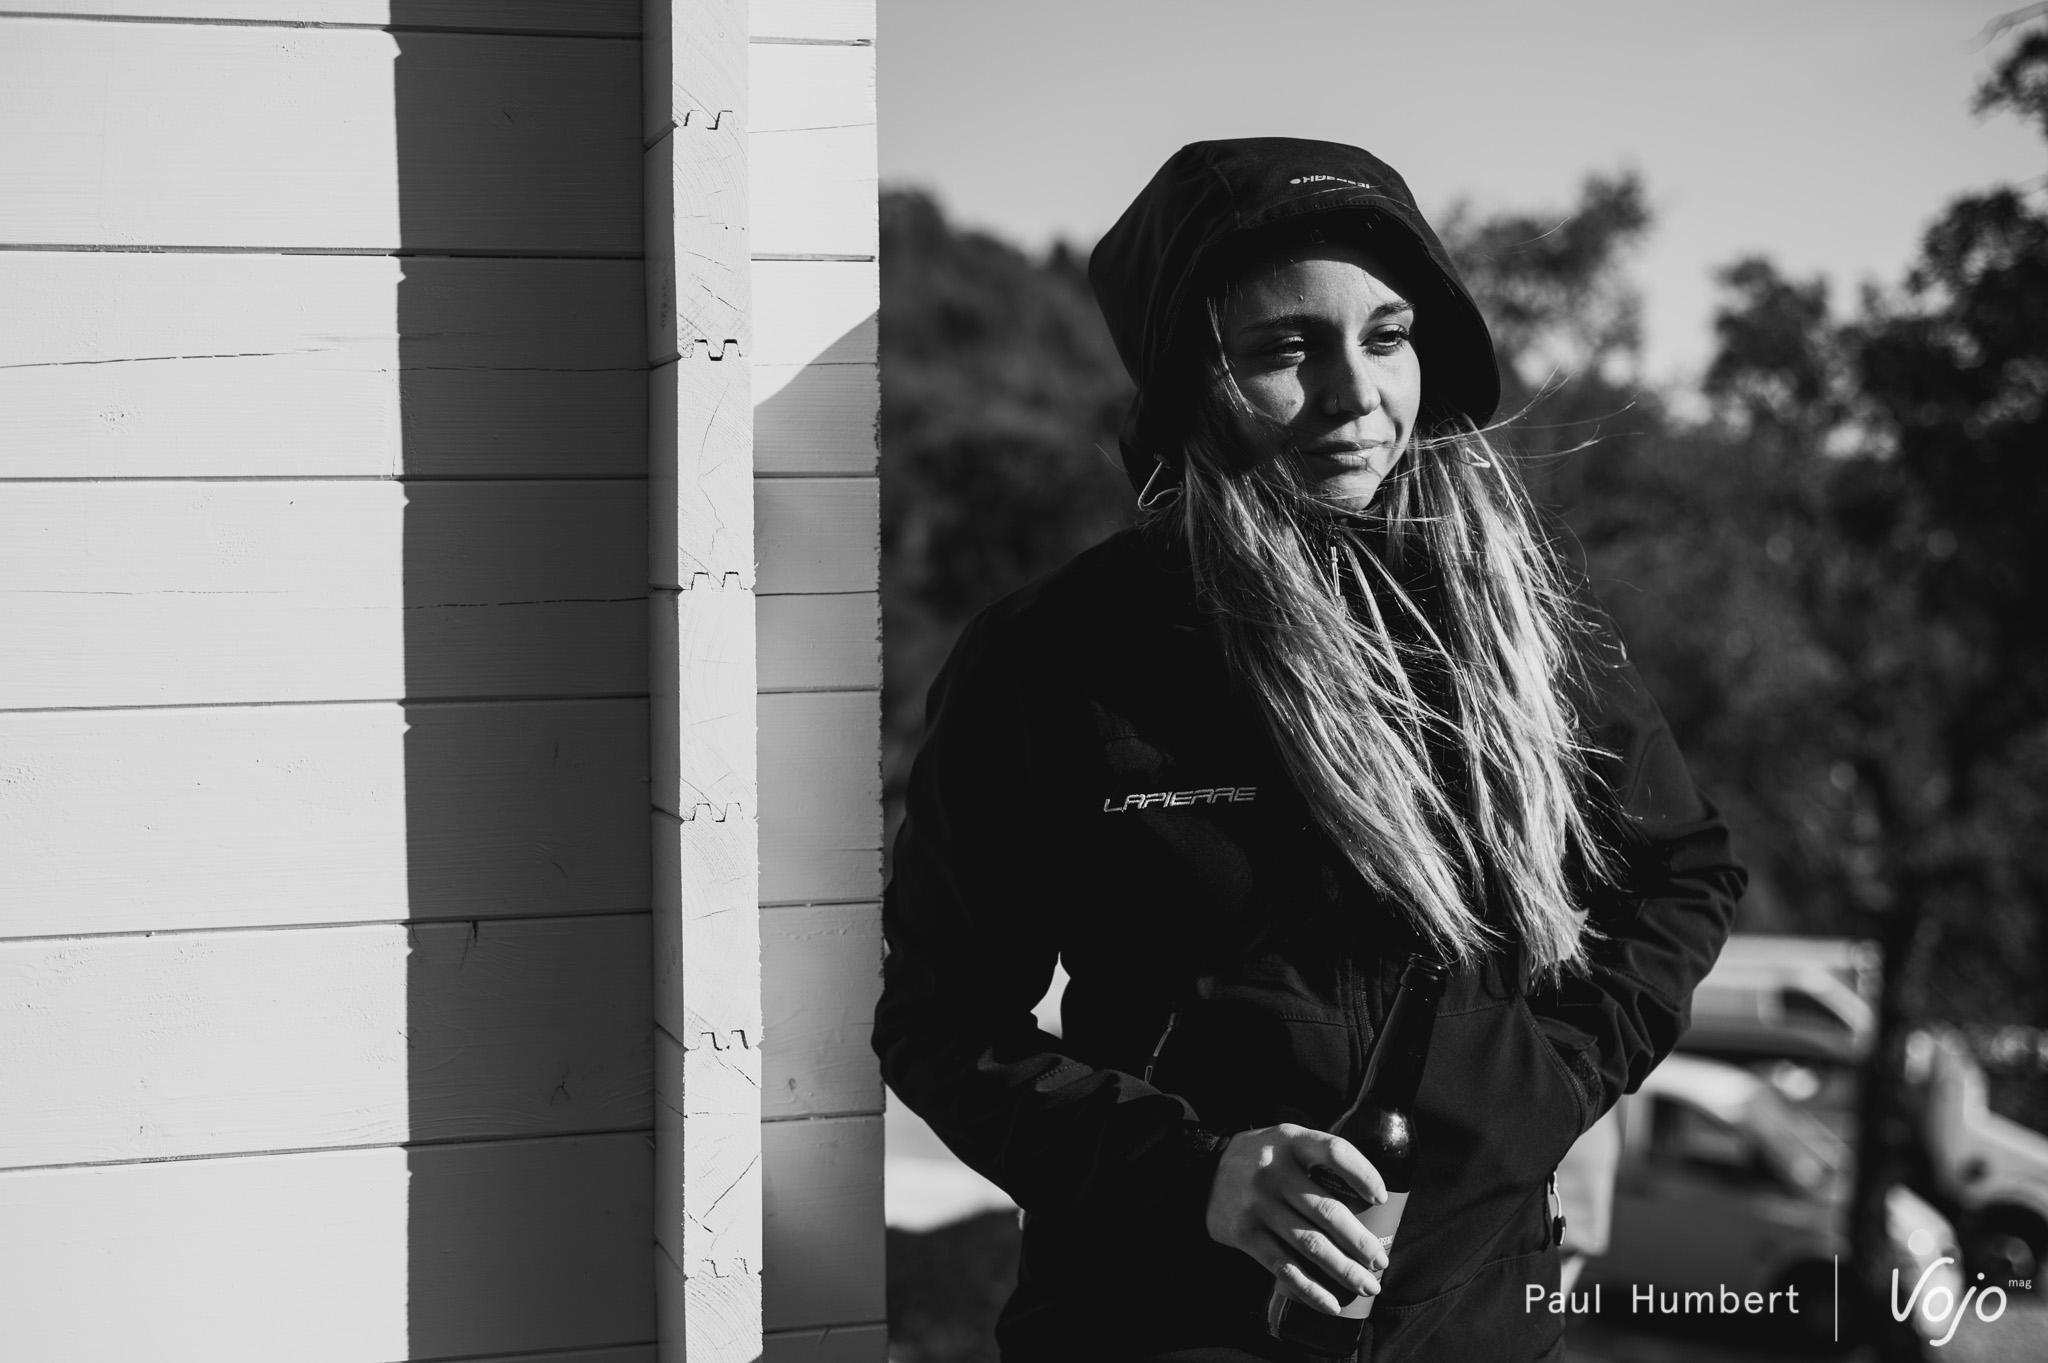 dailly-gallean-azur-bike-park-2017-vojo-paul-humbert